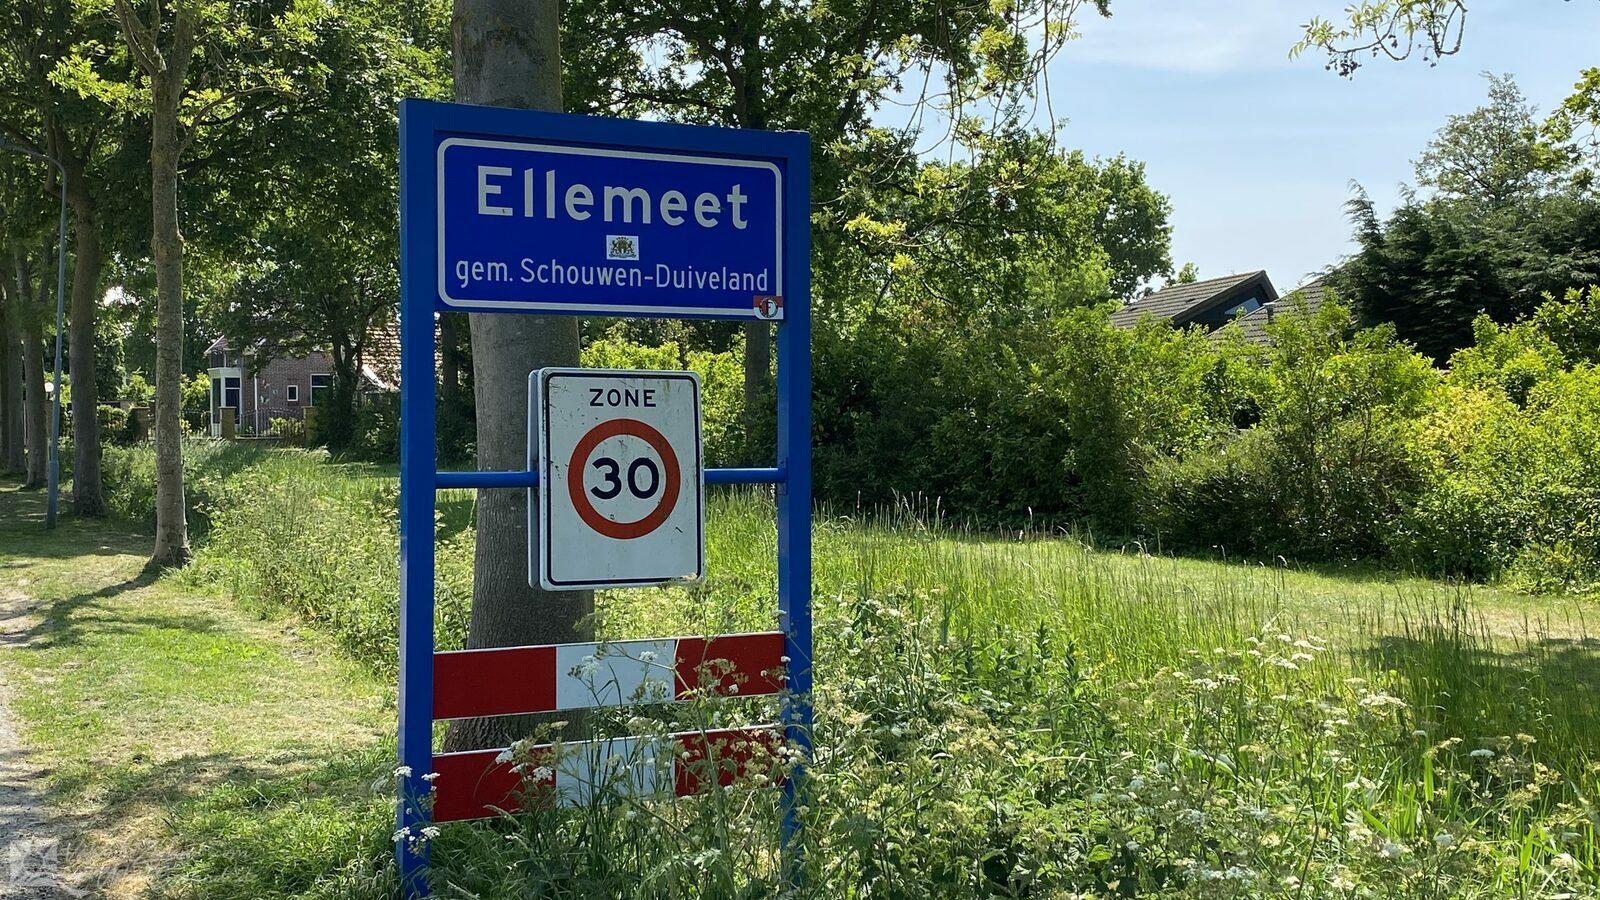 VZ670 Chalet Ellemeet